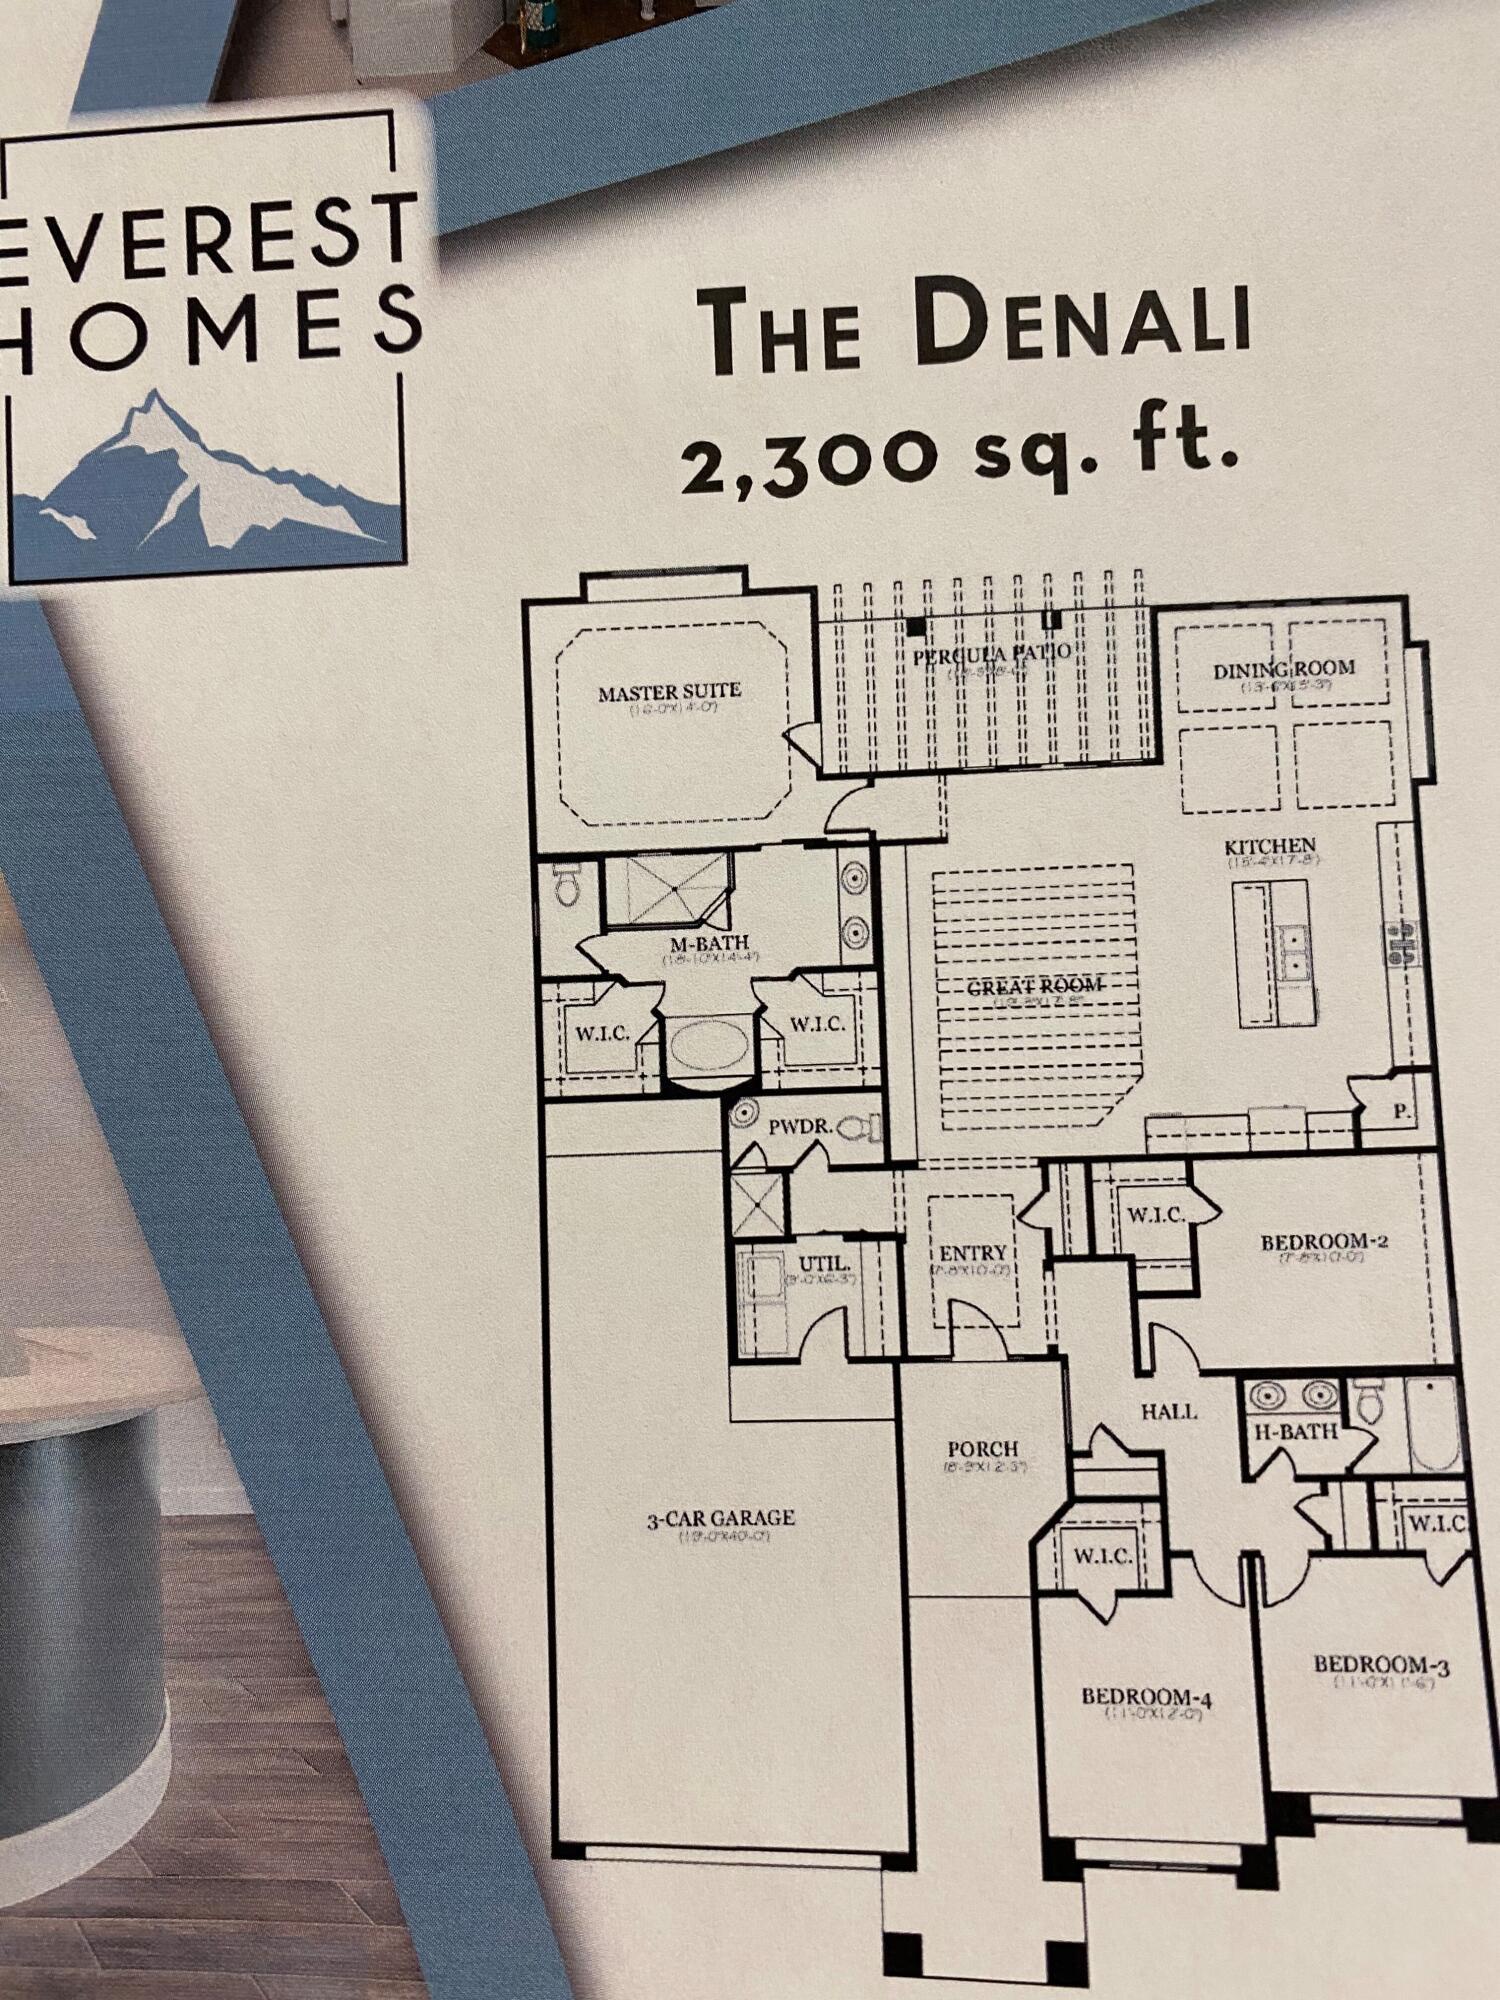 The Denali